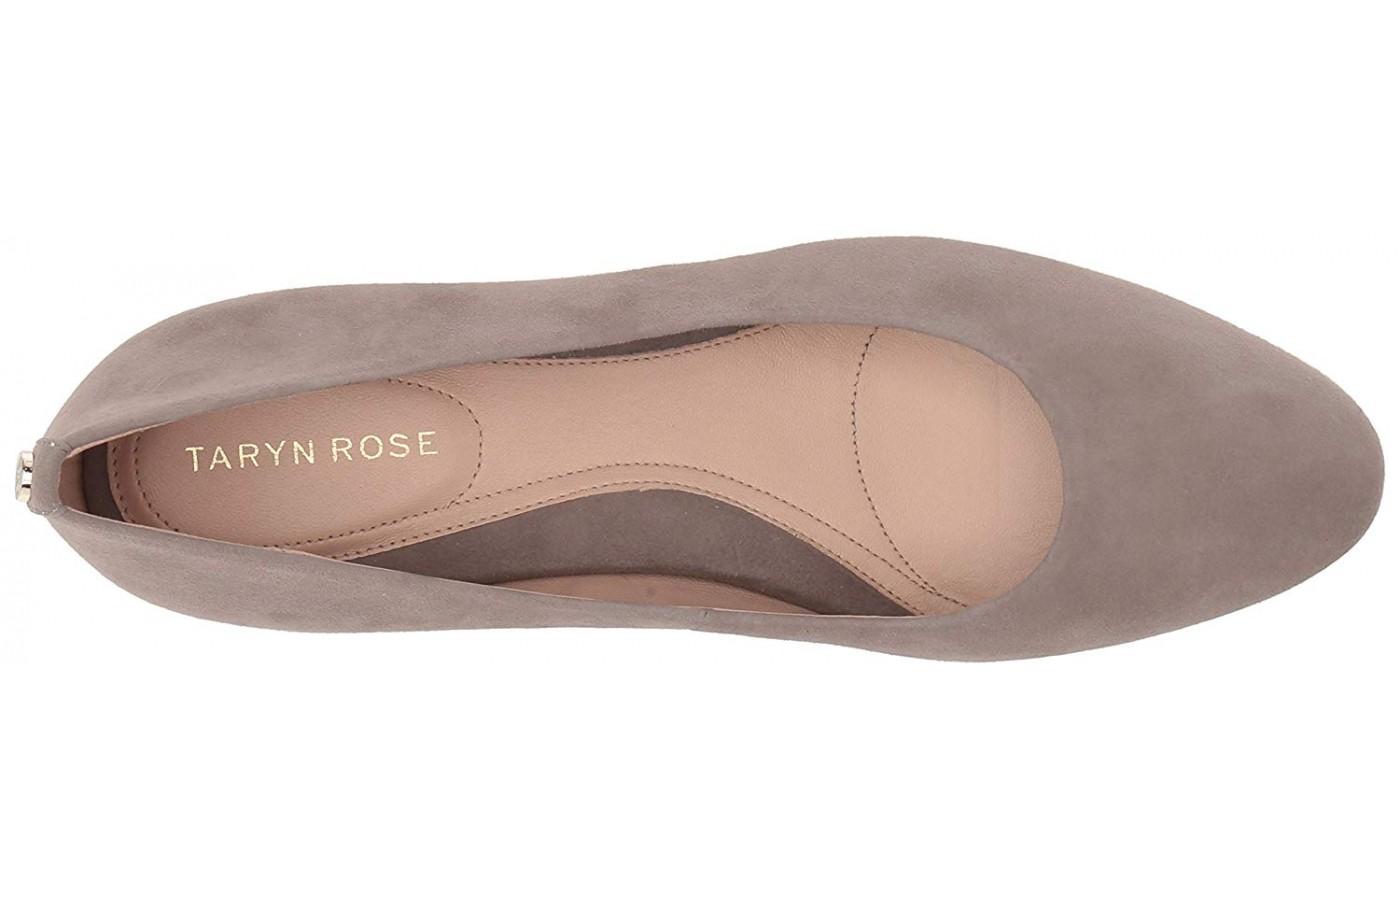 Taryn Rose Upper